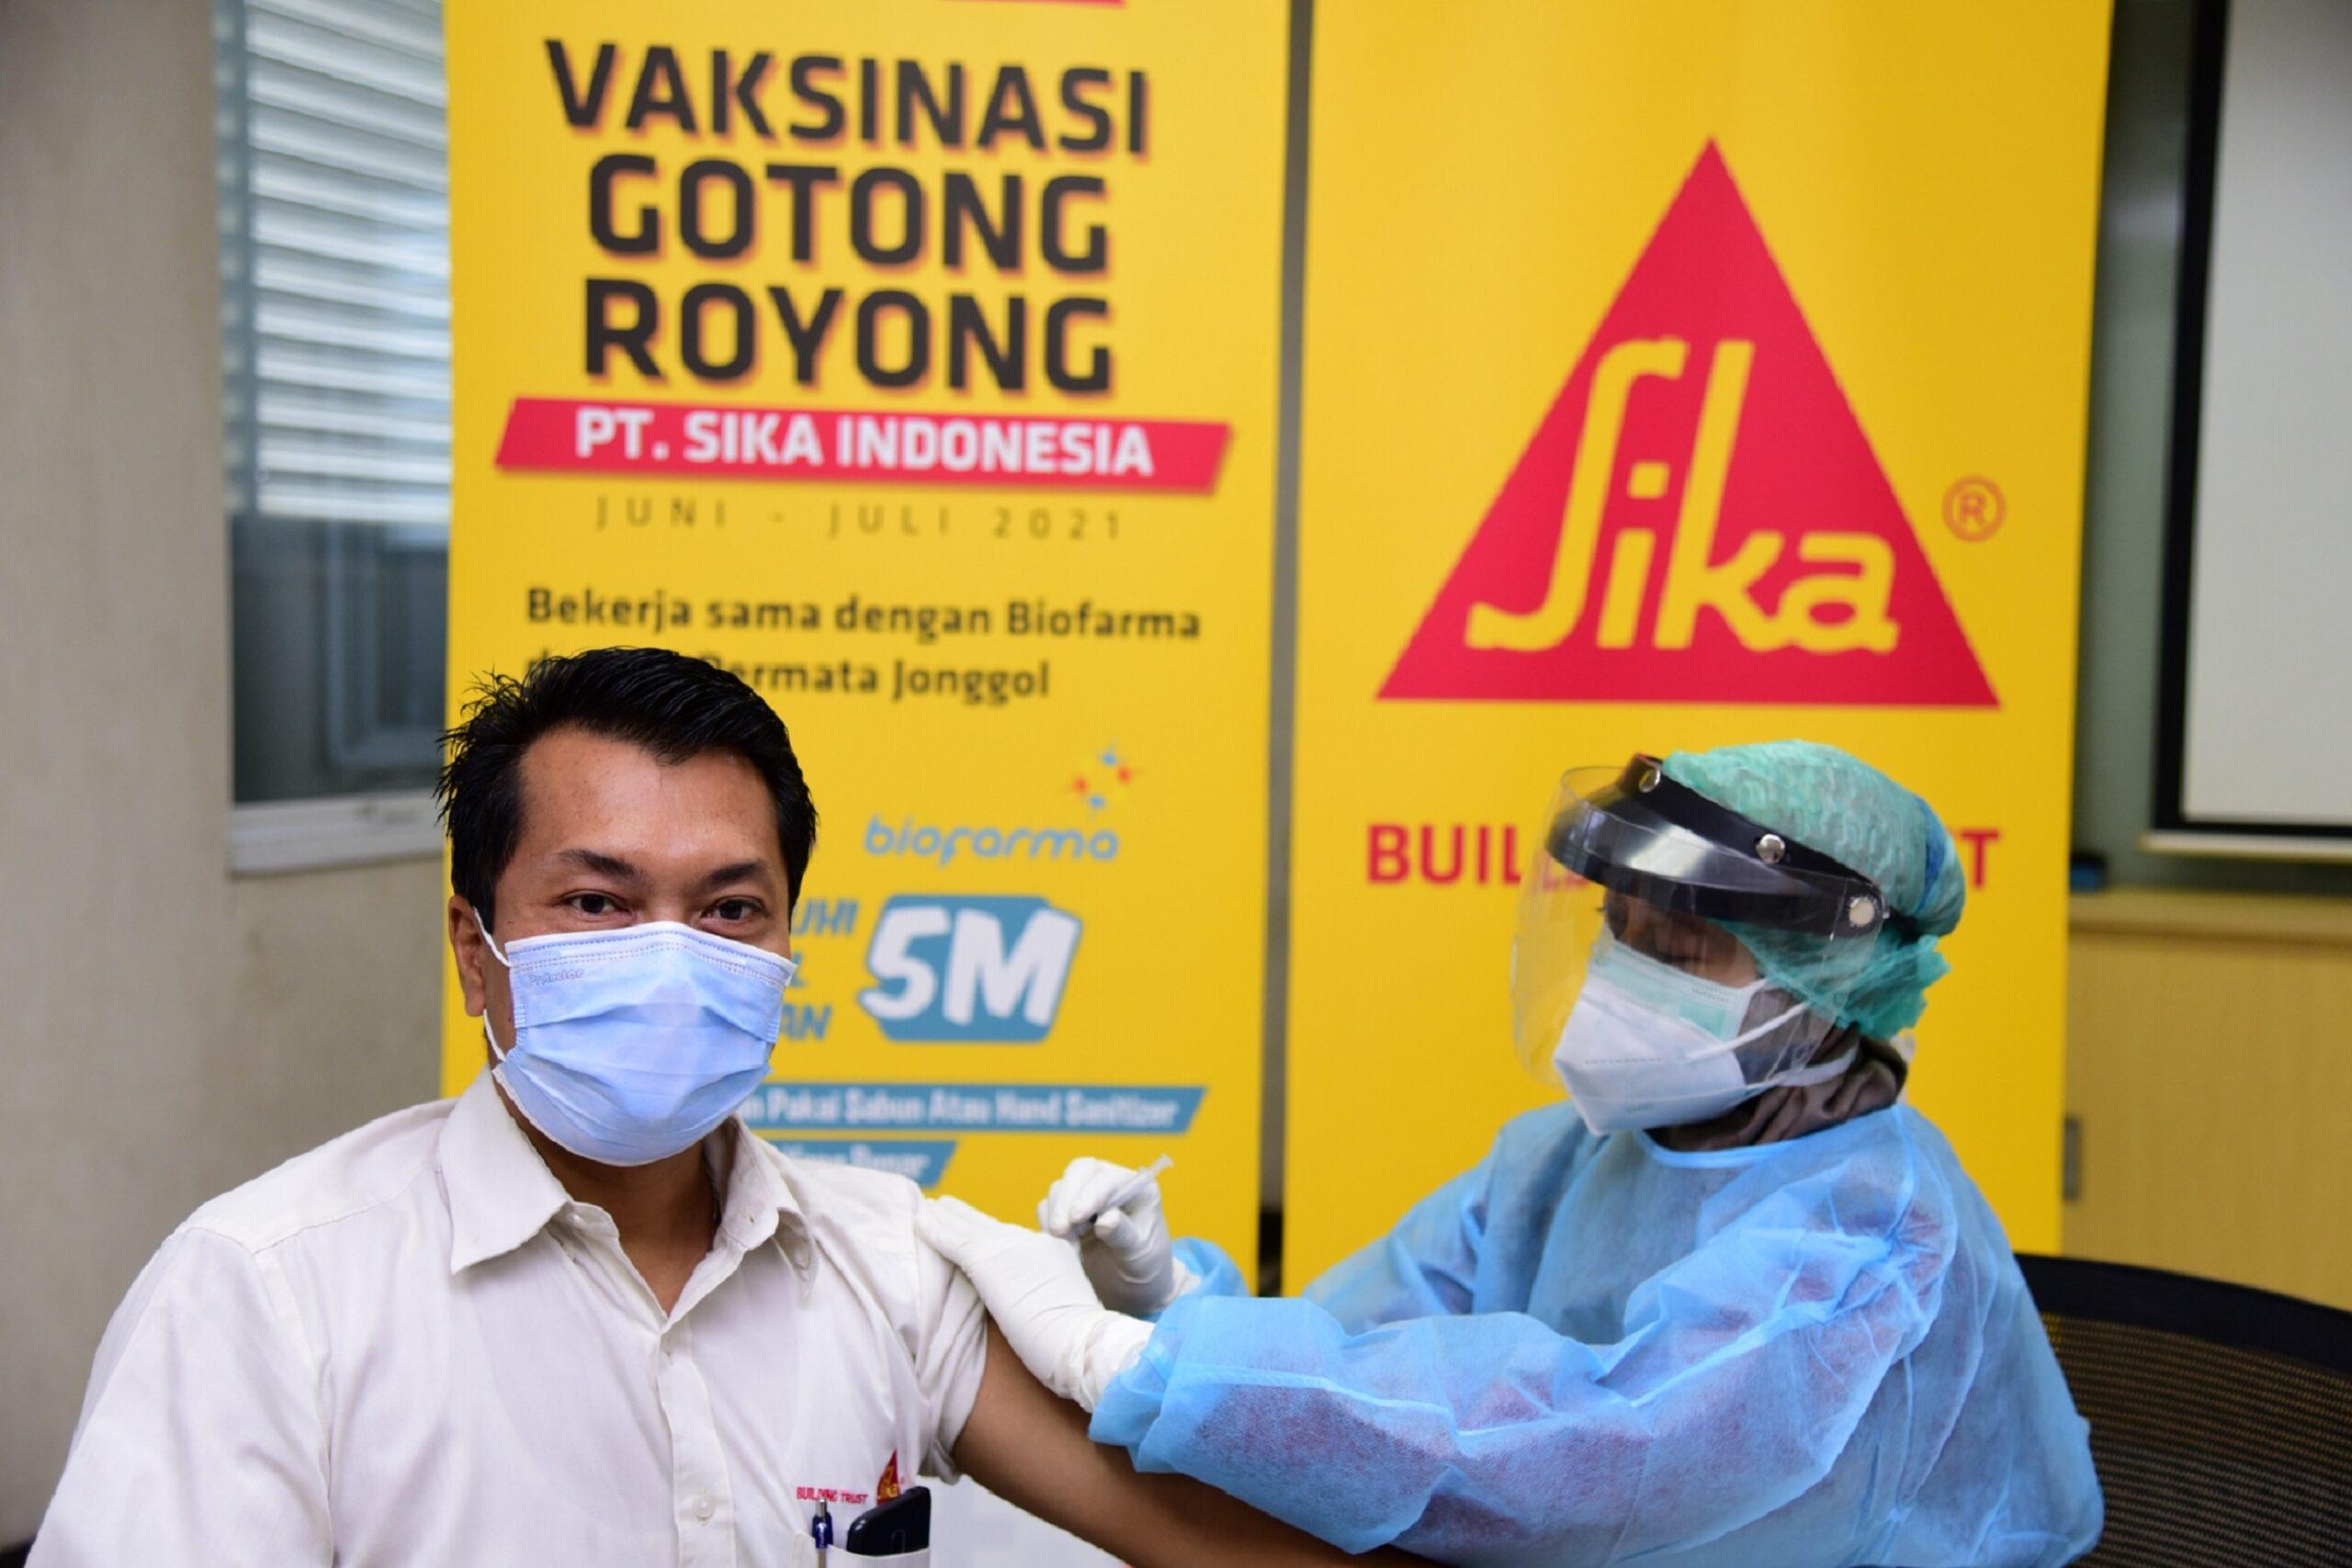 Sika Indonesia Lindungi Kesehatan Pekerja Lewat Vaksinasi Covid-19